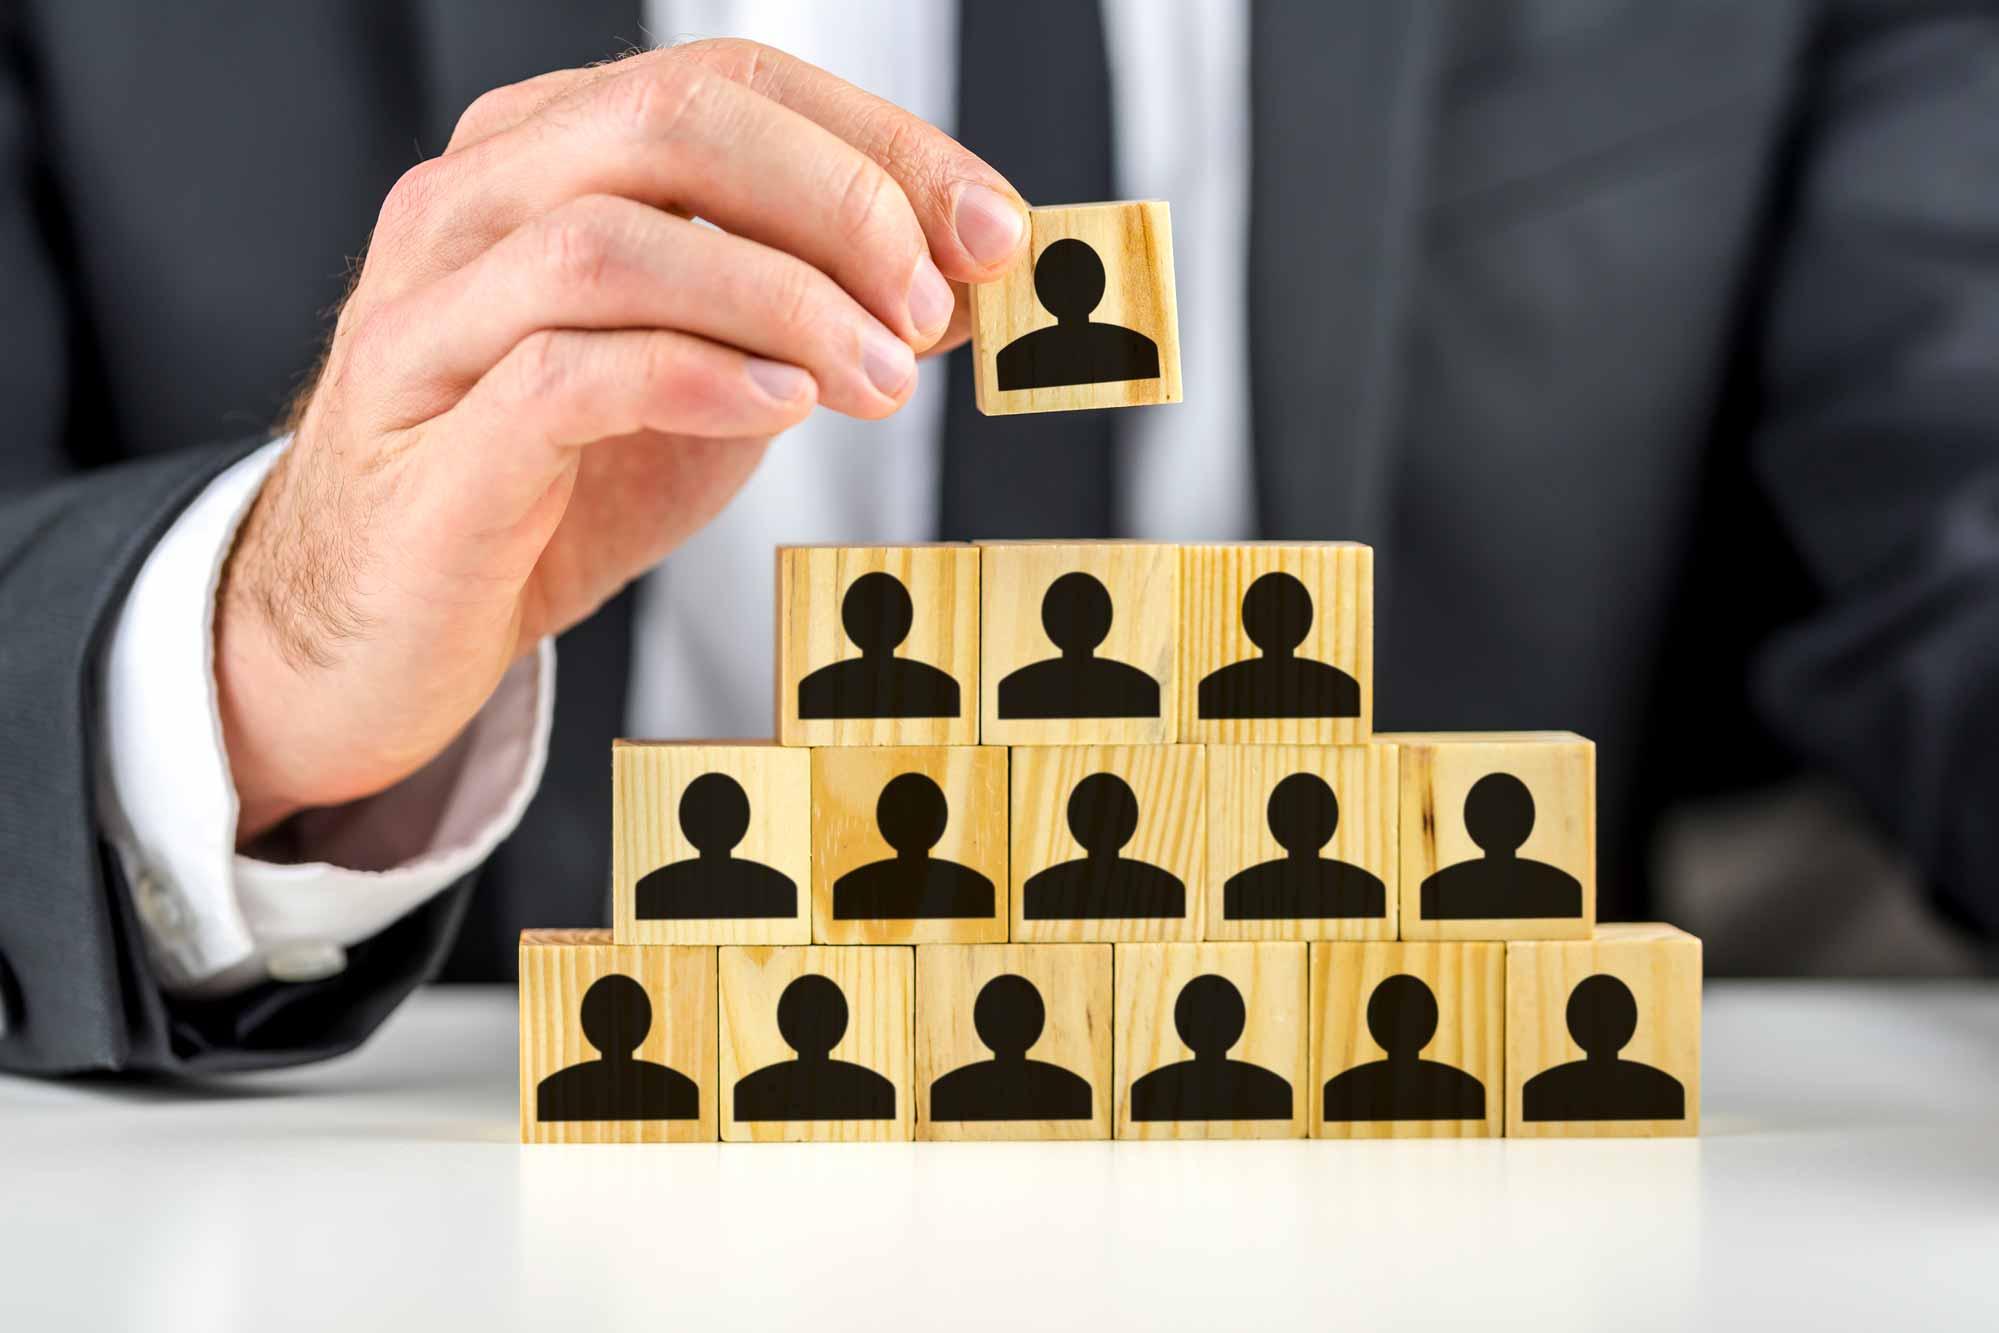 Over 2.5 million Australians looking for work entering 2020